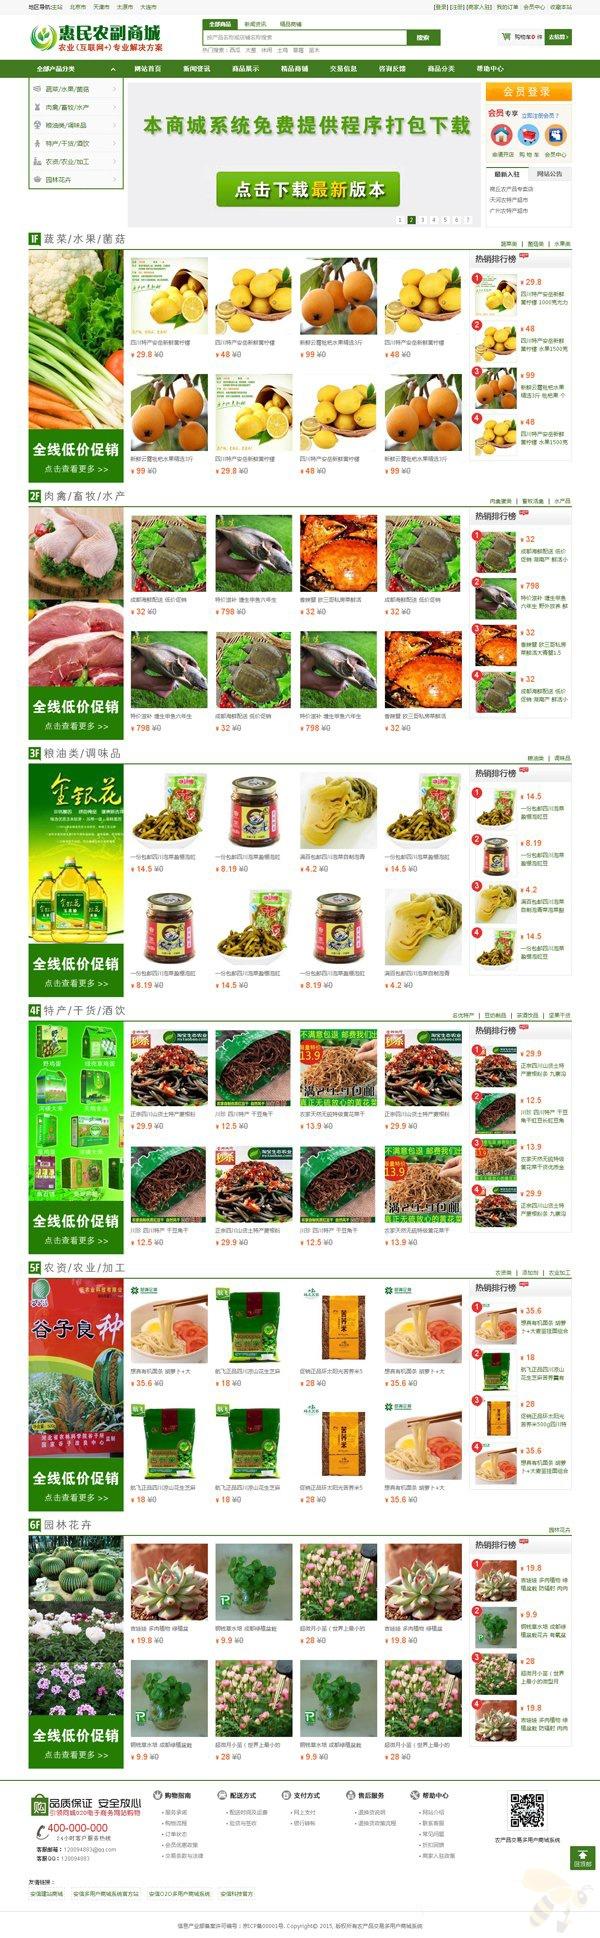 ASP农产品交易多用户商城系统(免费无限版)微信扫码支付+手机WAP+微网站